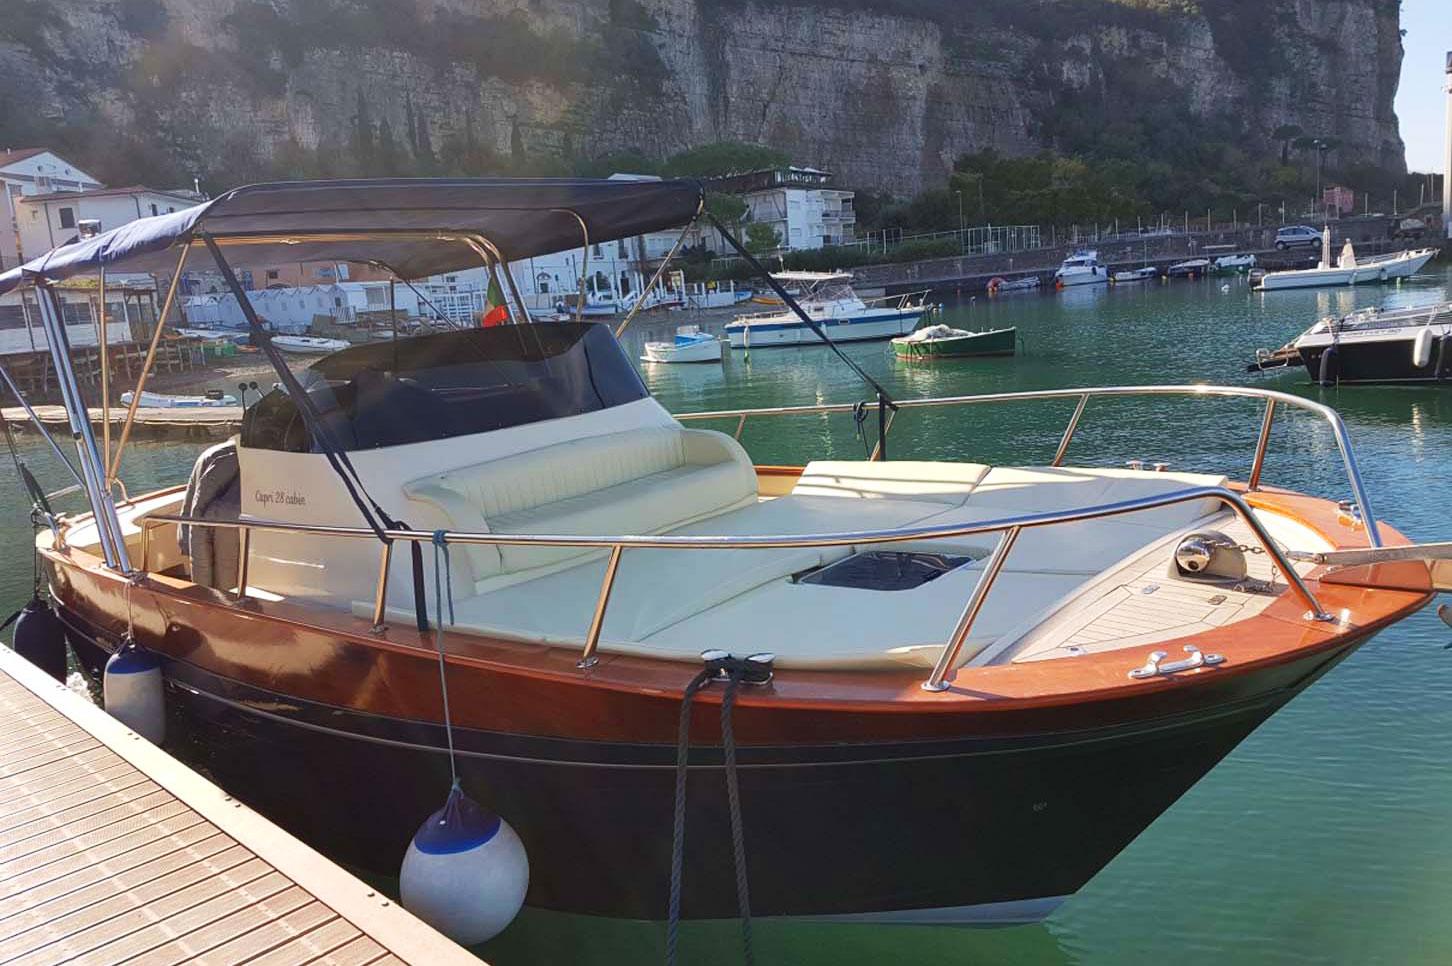 Alfamarinecharter rental sorrento boat tour capri positano zetamare 850